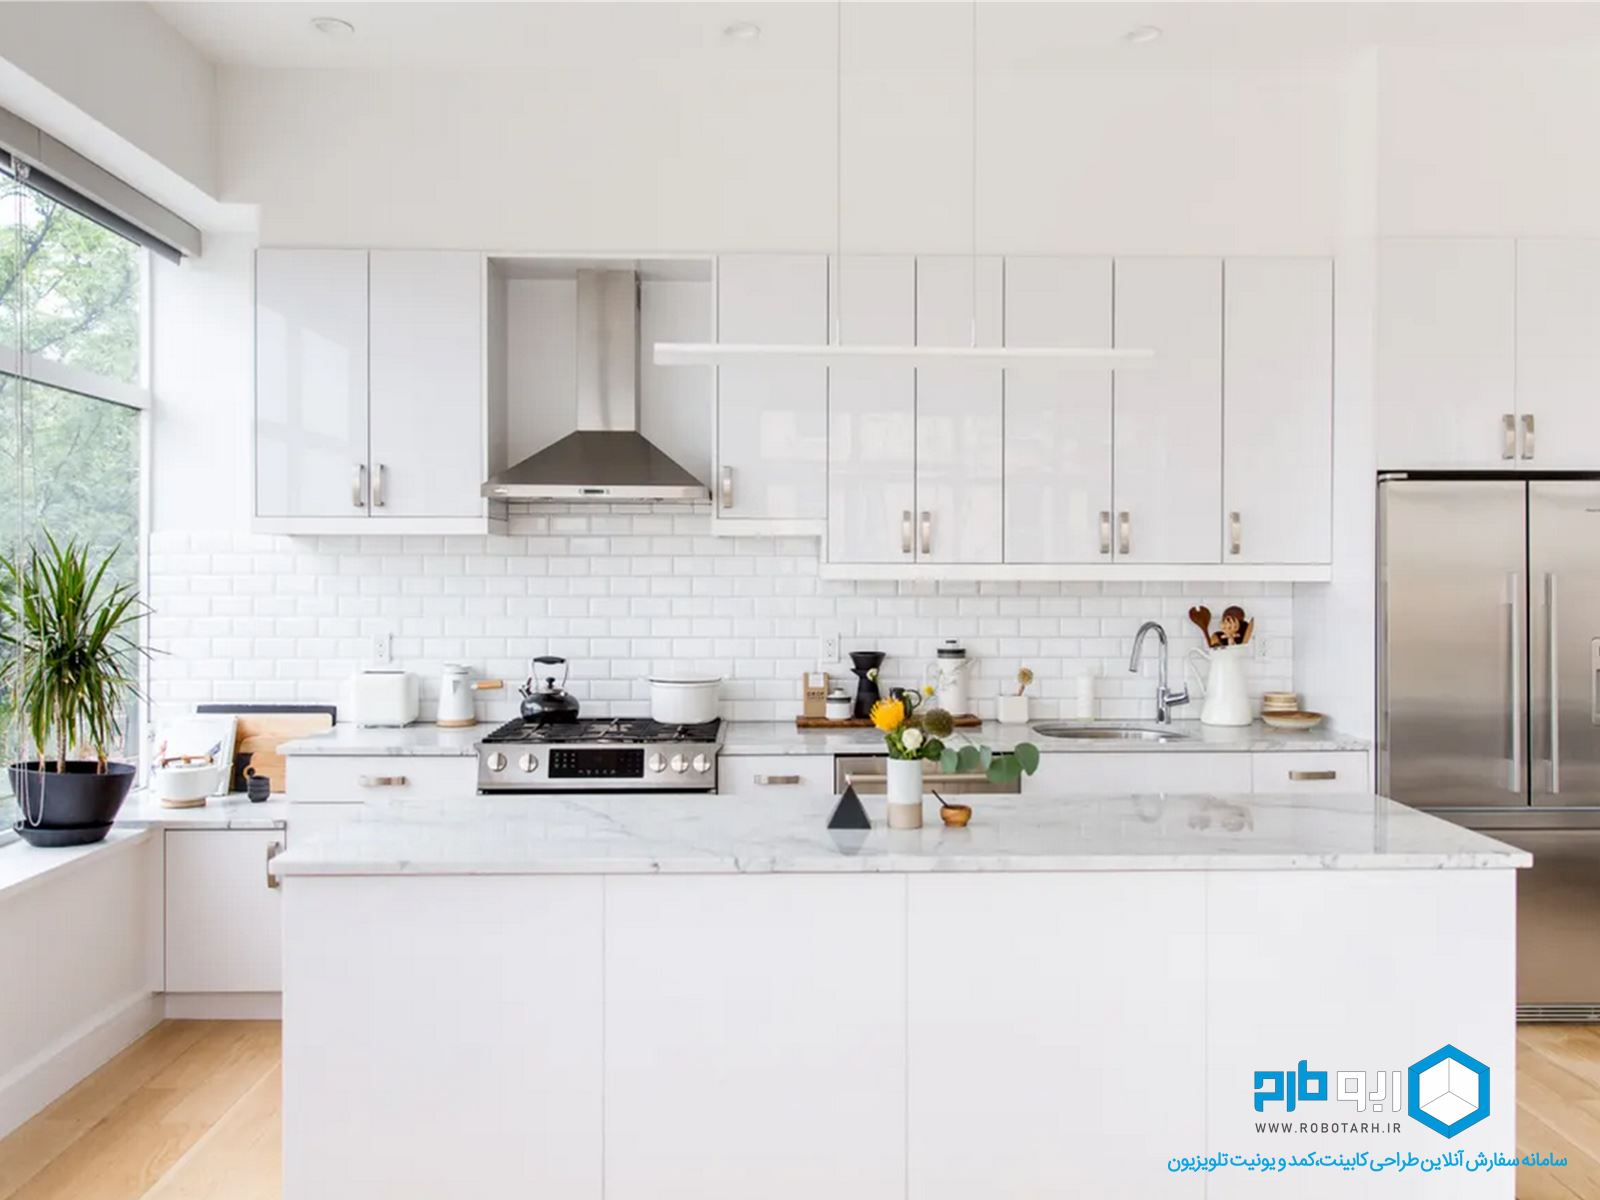 آشپزخانه خطی یا تک دیواری